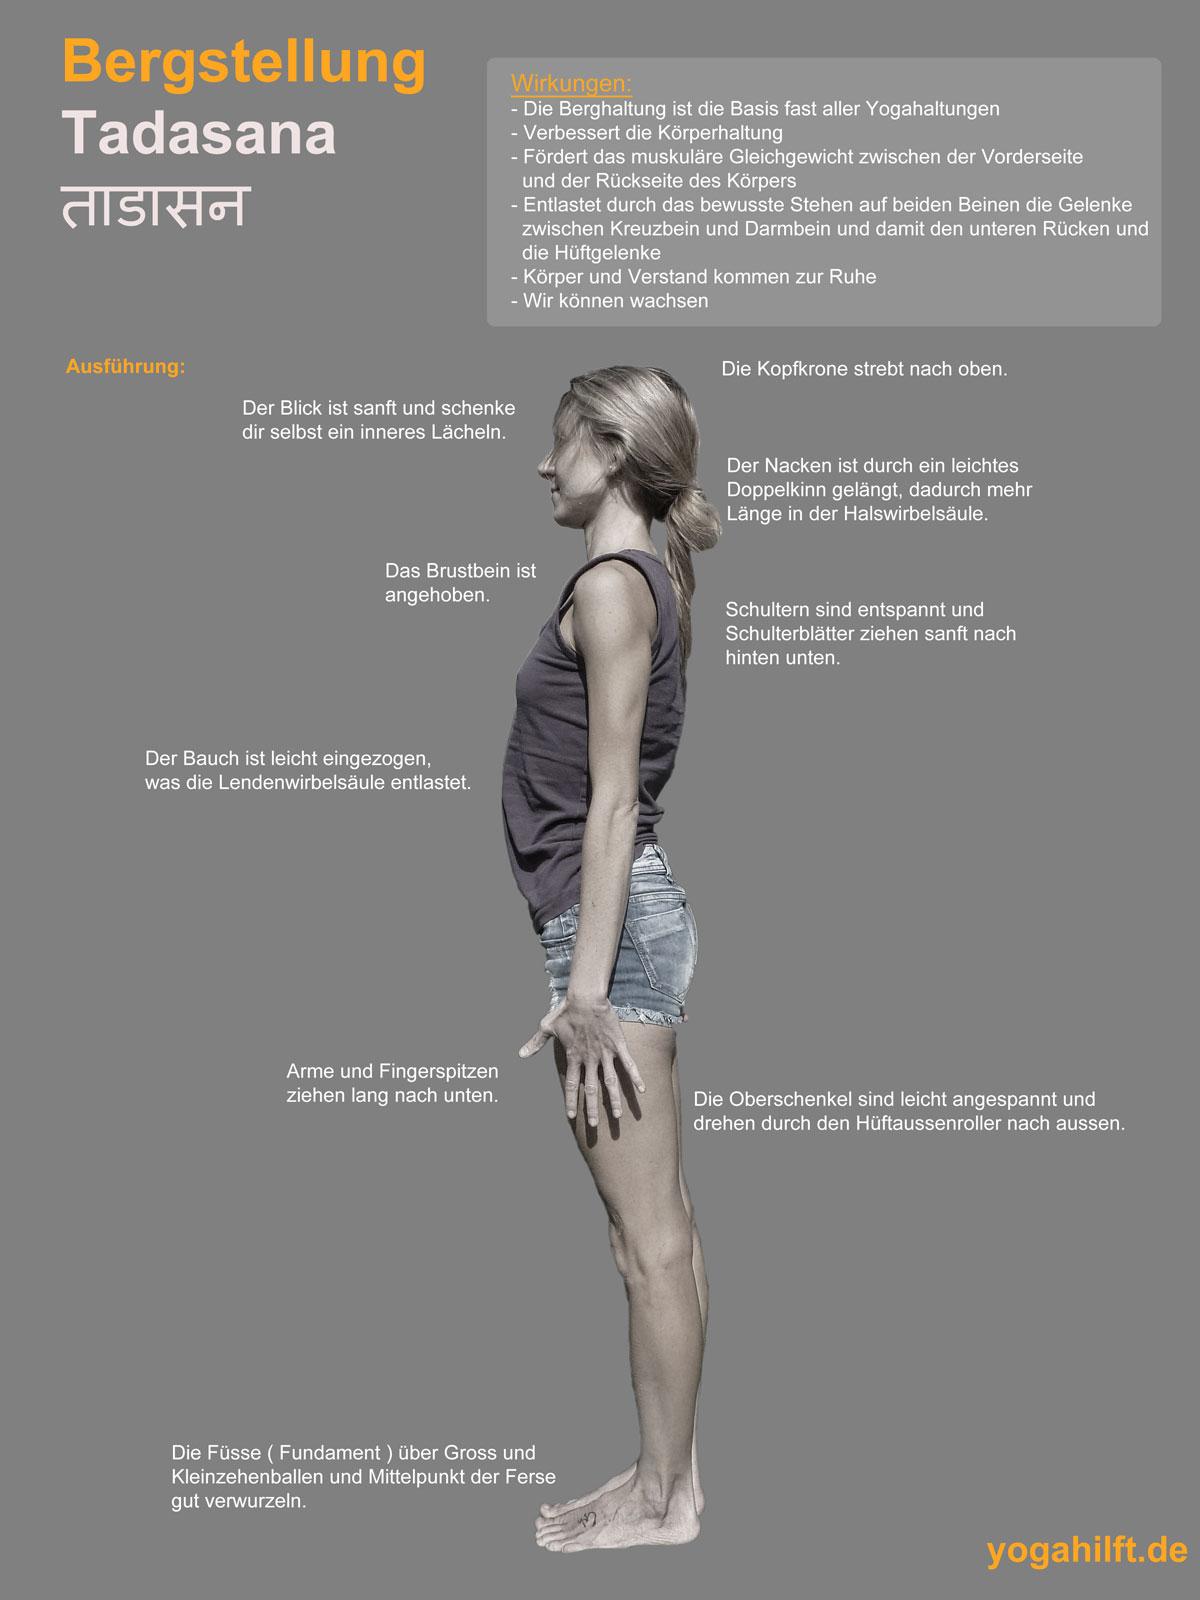 Yoga Onlinekurse - Yogahilft.de